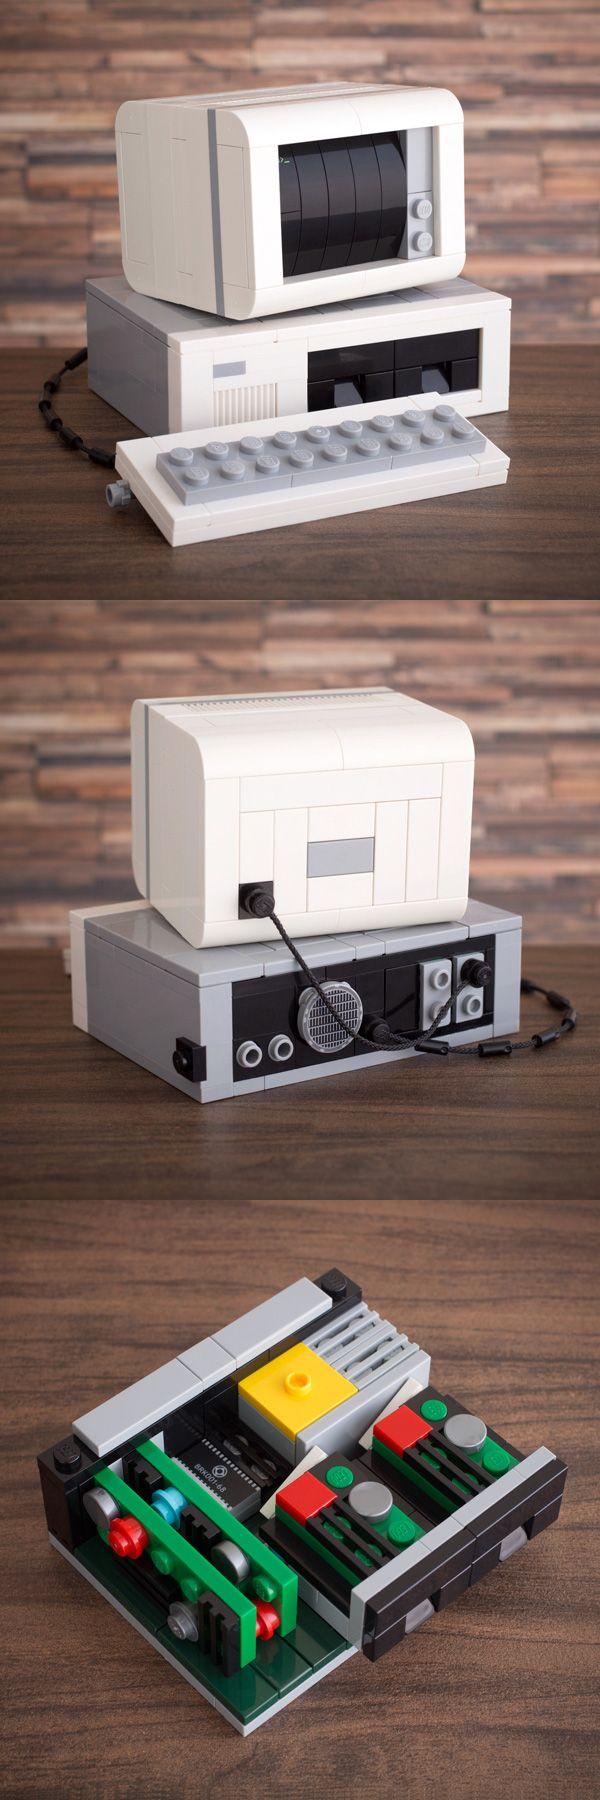 U0027My First Computer: DOS Editionu0027 Custom LEGO Kit By Chris McVeigh